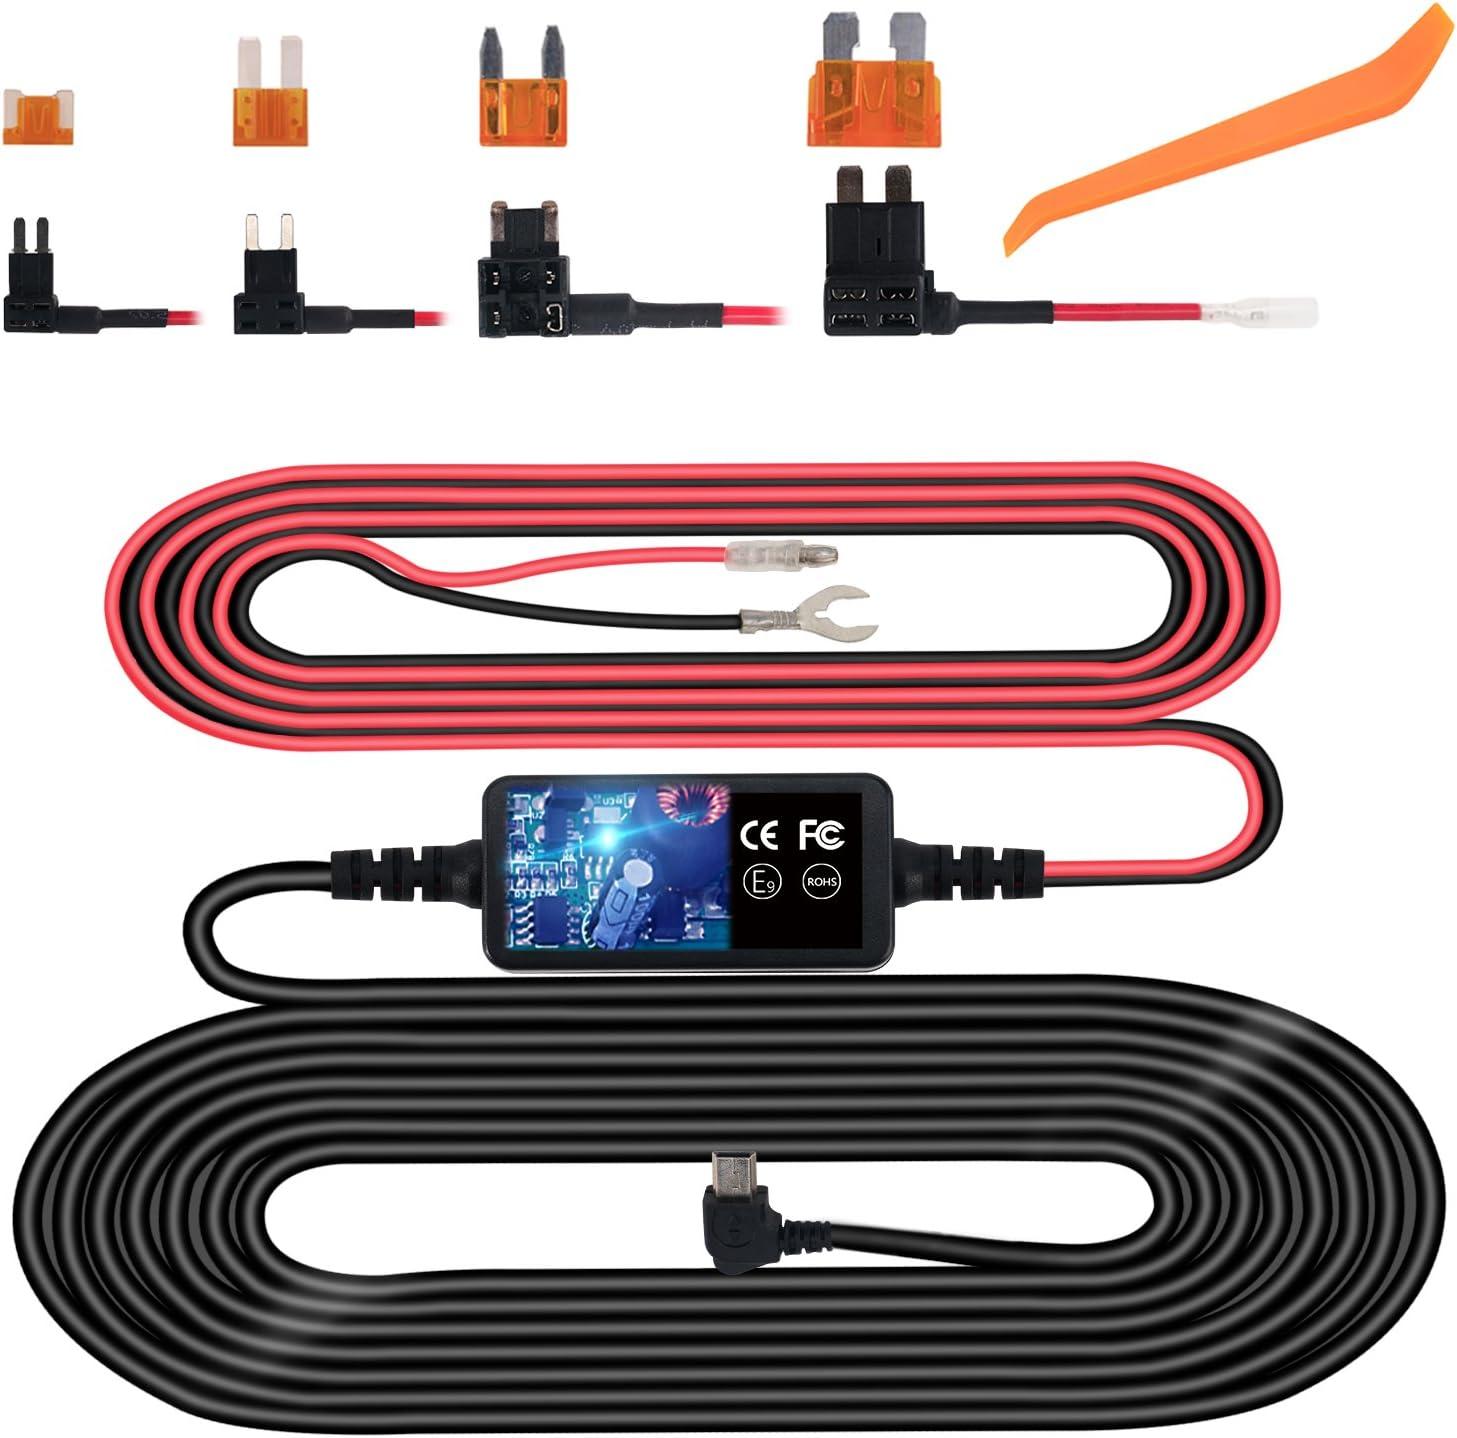 small fuse box wiring amazon com dash cam hardwire kit  mini usb hard wire kit fuse for  amazon com dash cam hardwire kit  mini